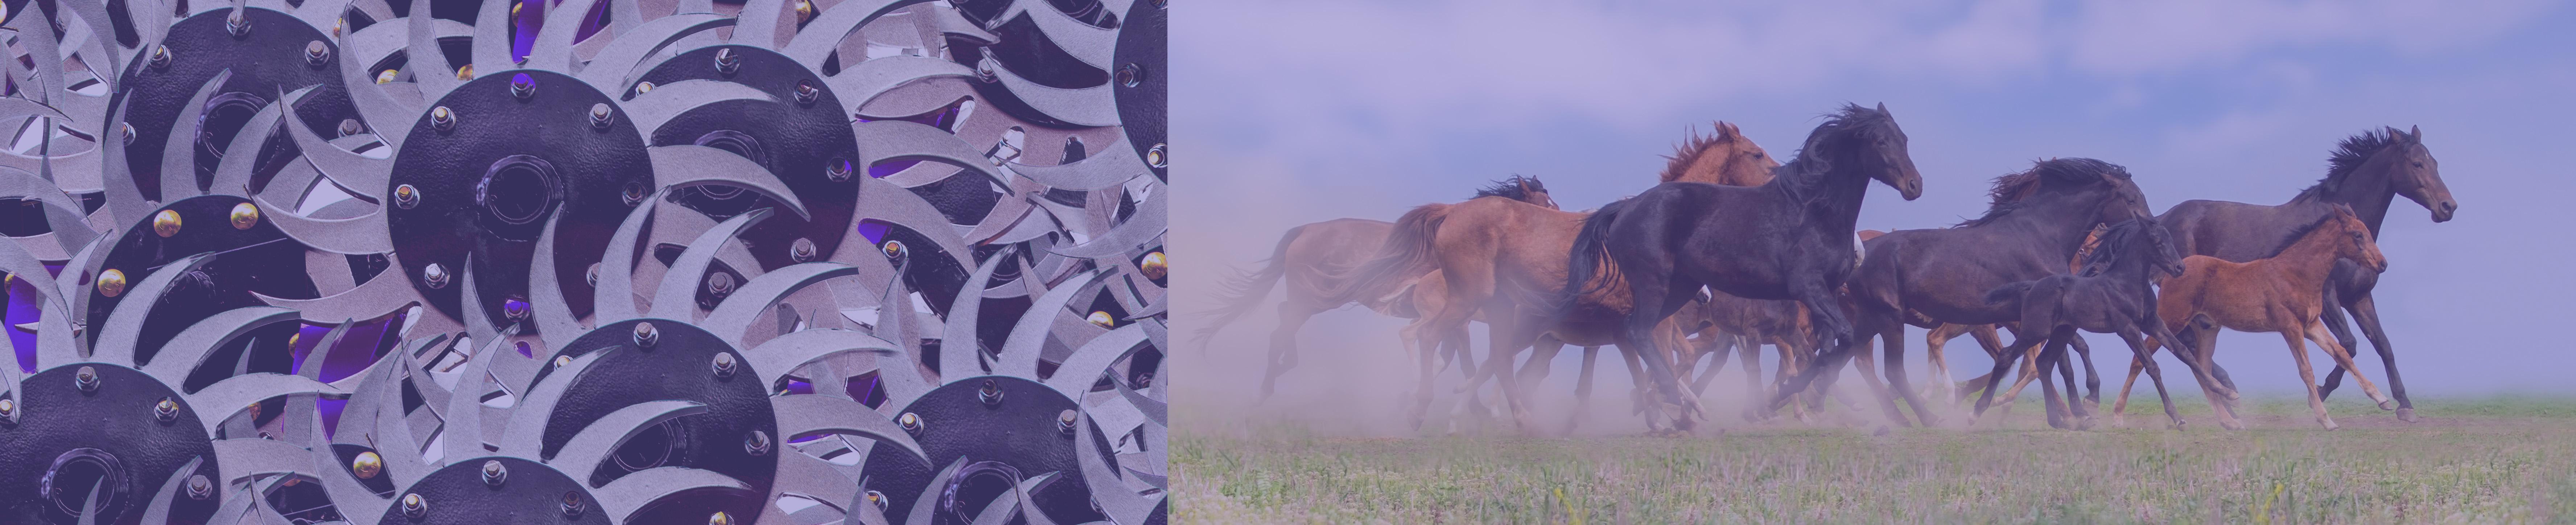 Harrow_Running Horses